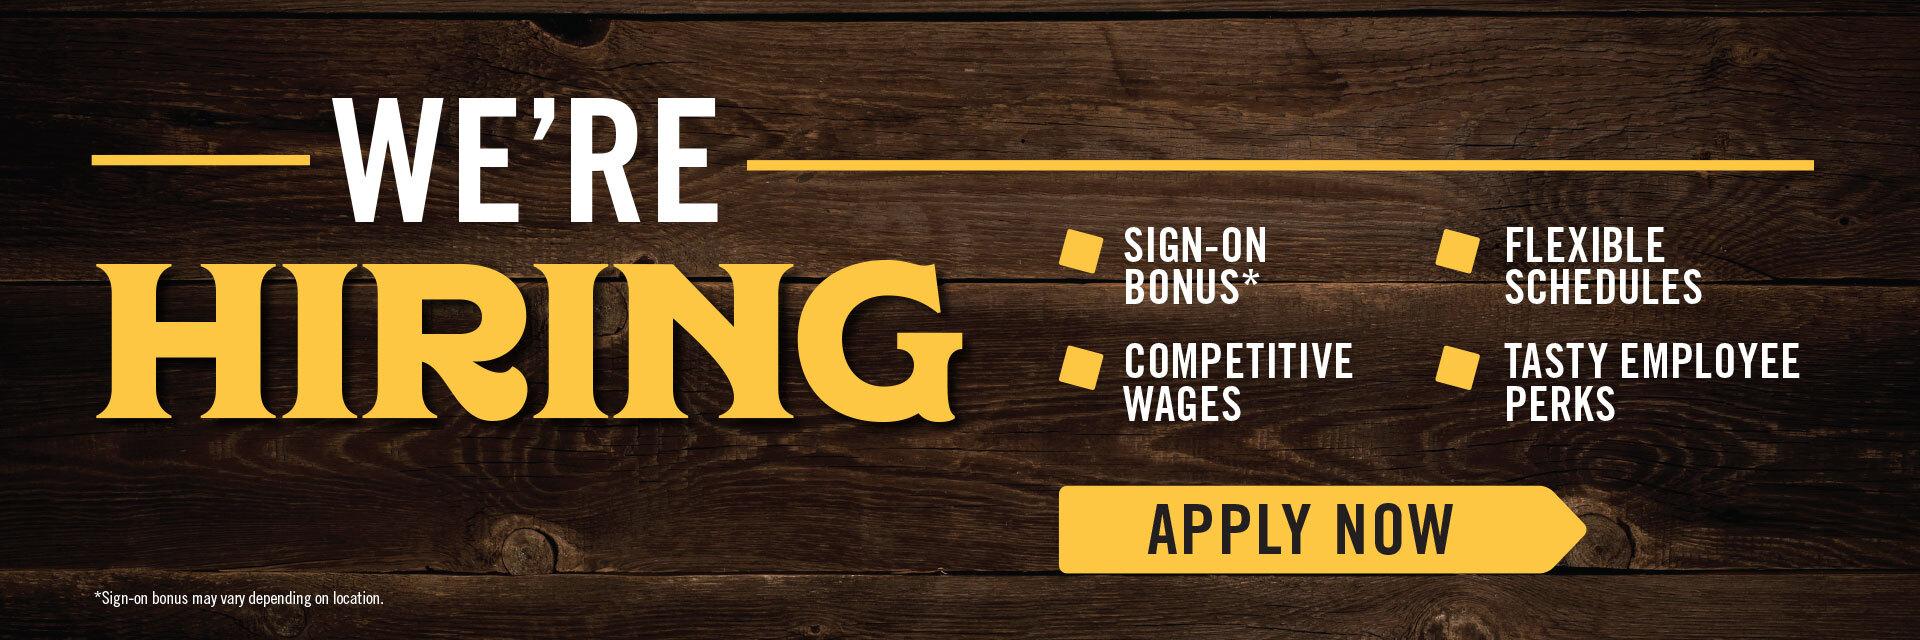 We're hiring. Apply Now.